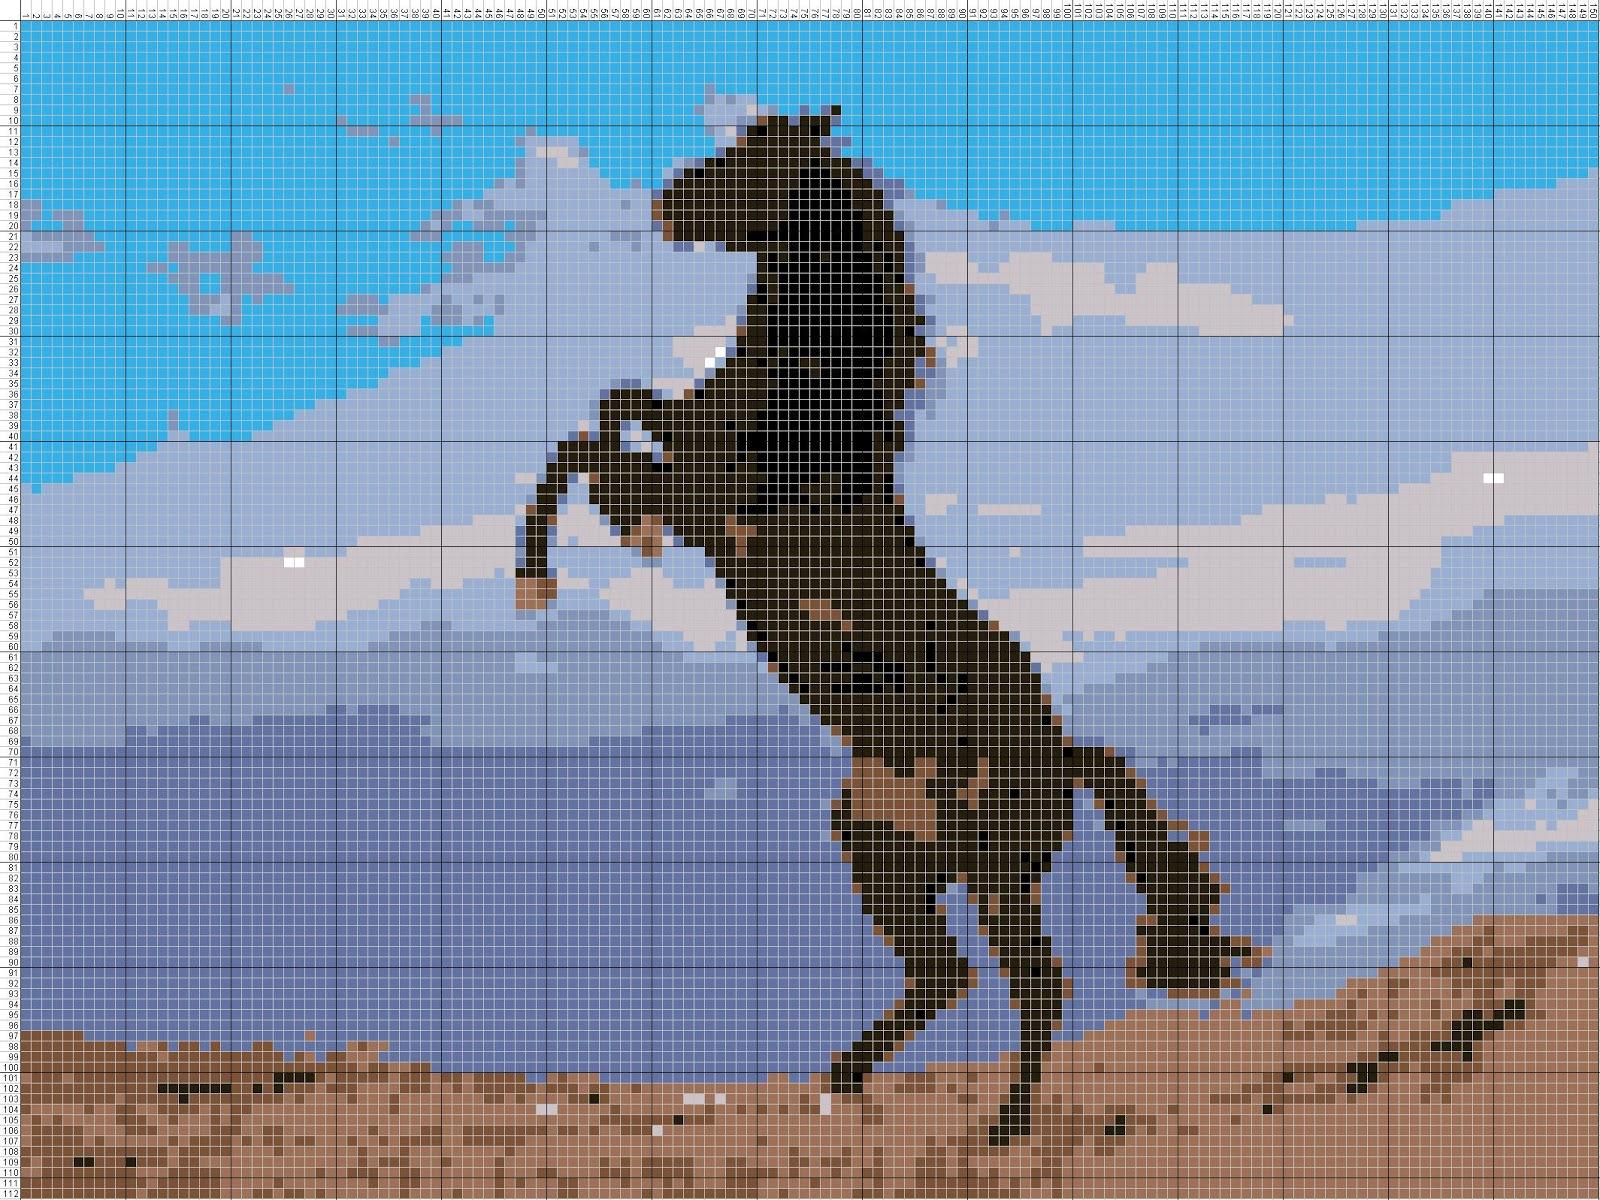 gambar kuda hitam - gambar kuda - gambar kuda hitam